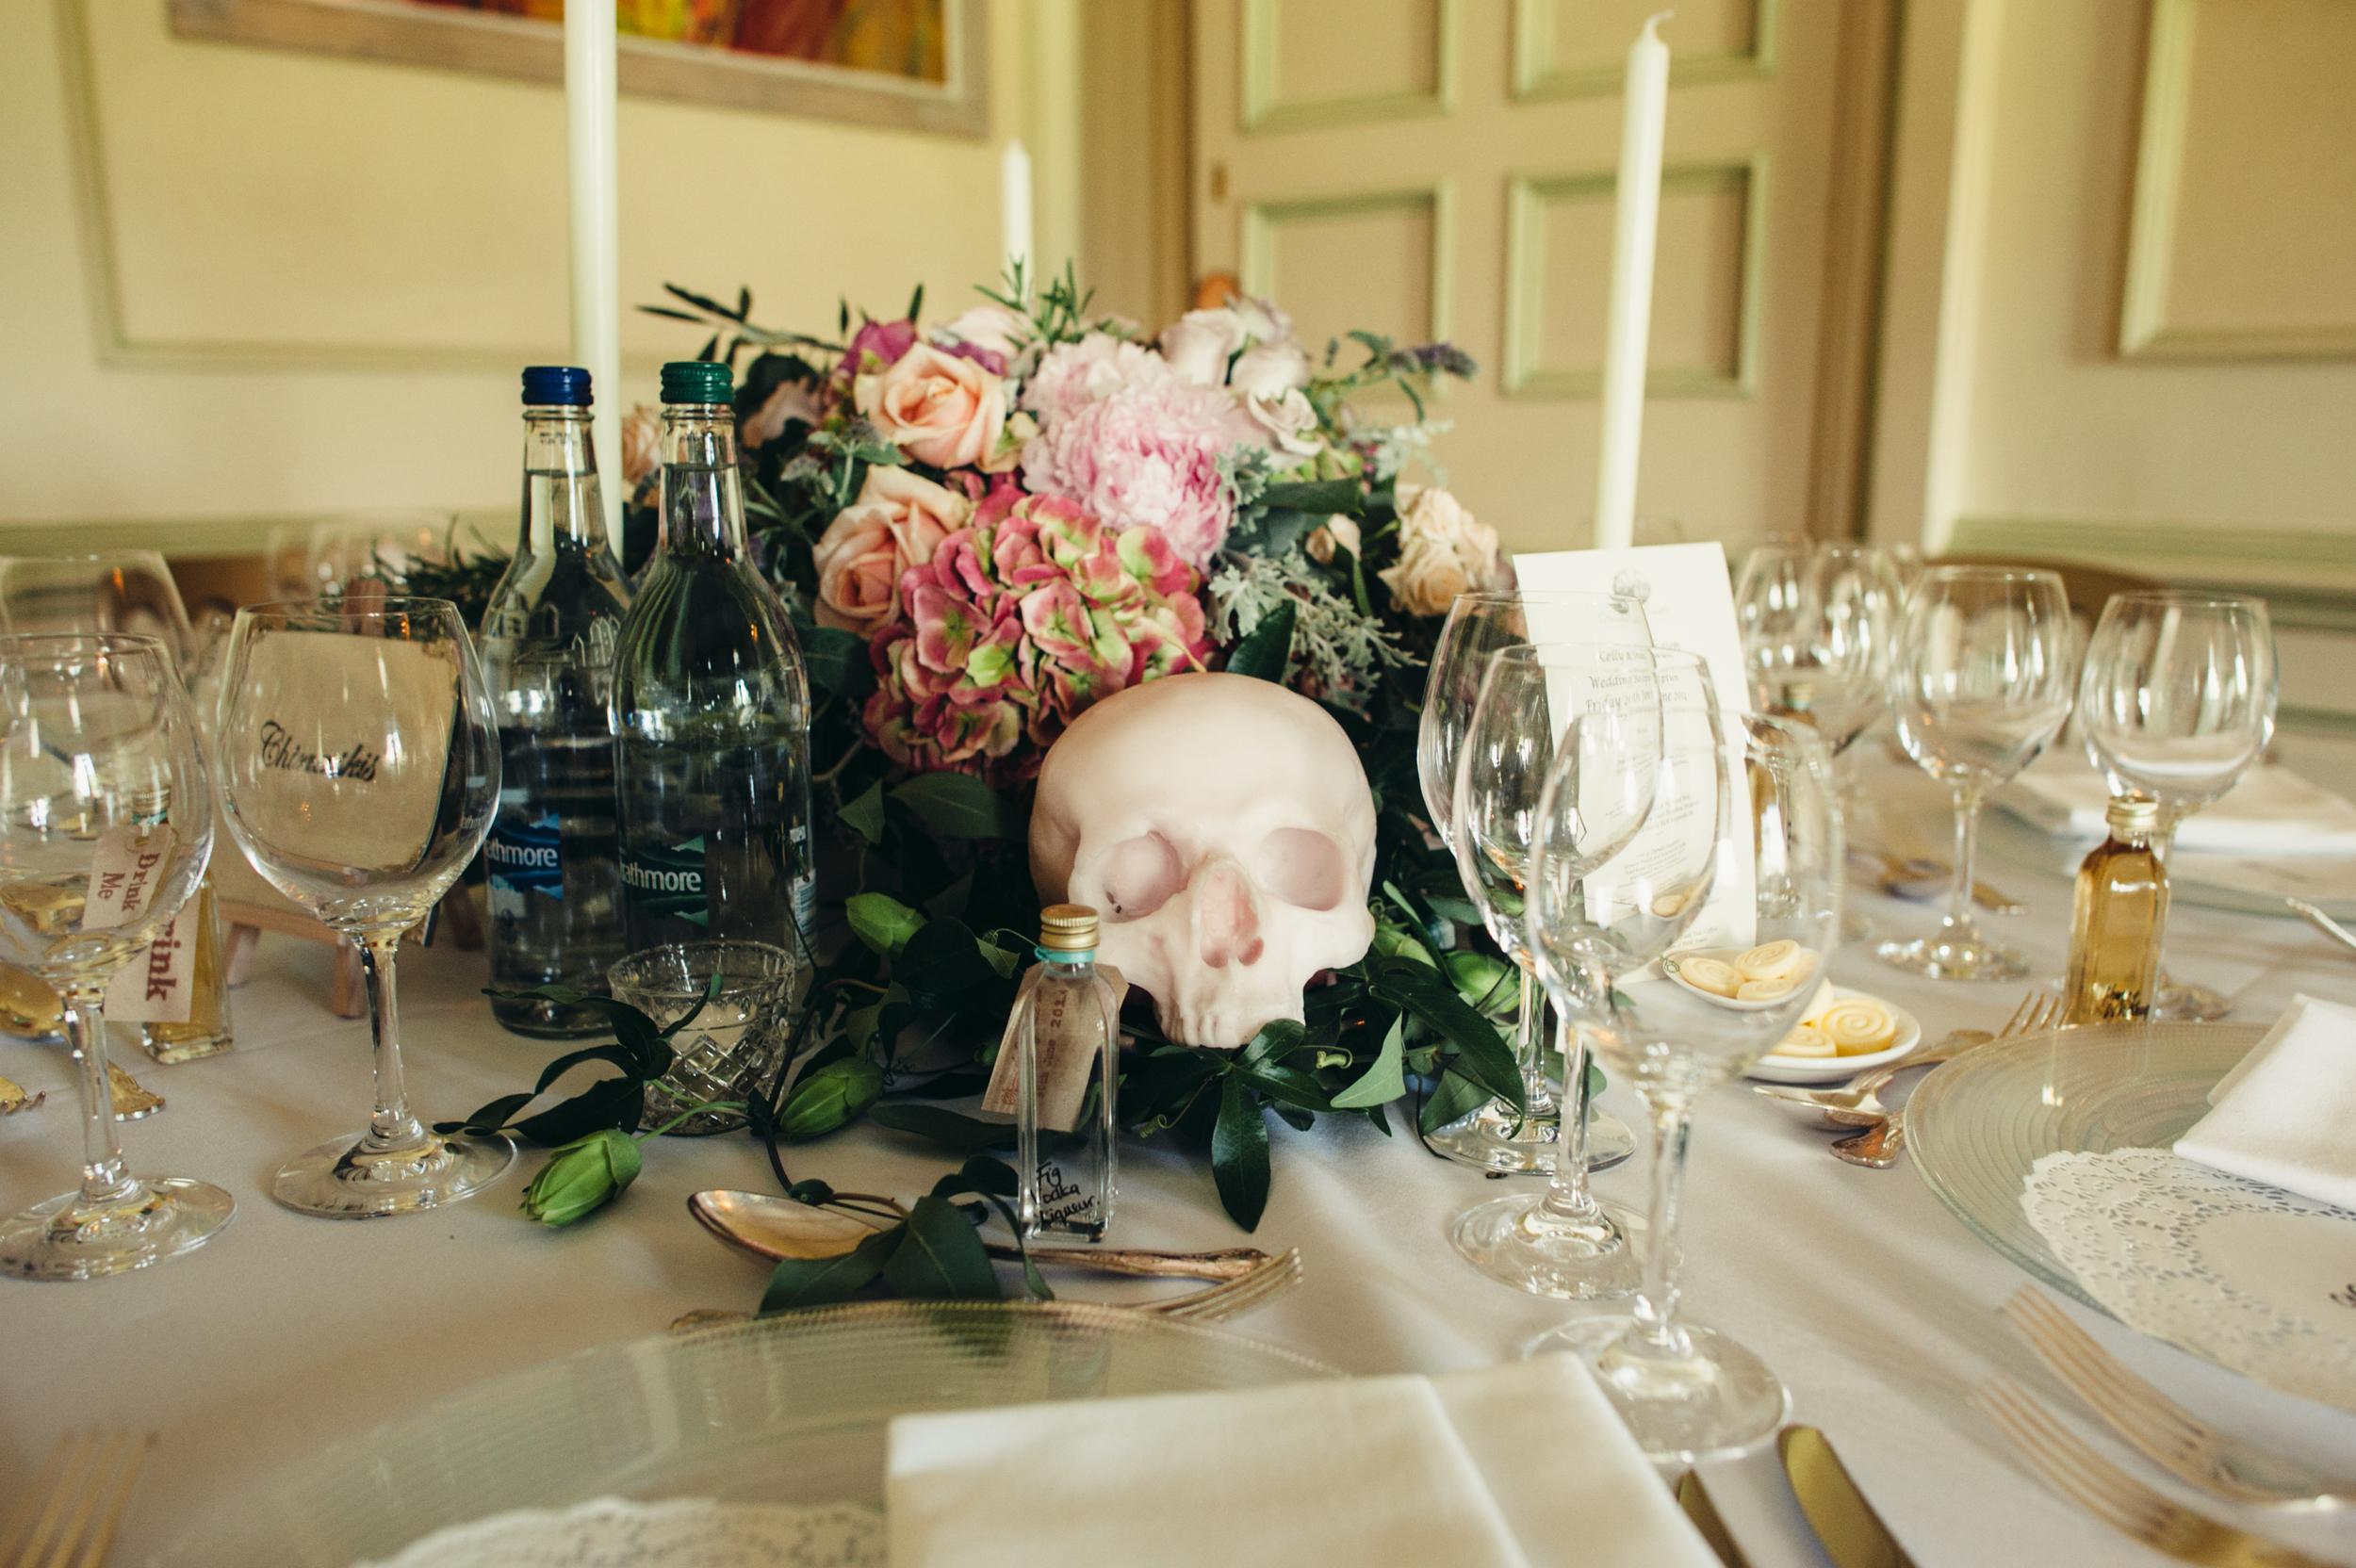 0120-lisa-devine-alternative-creative-wedding-photography-glasgow-edinburgh.JPG